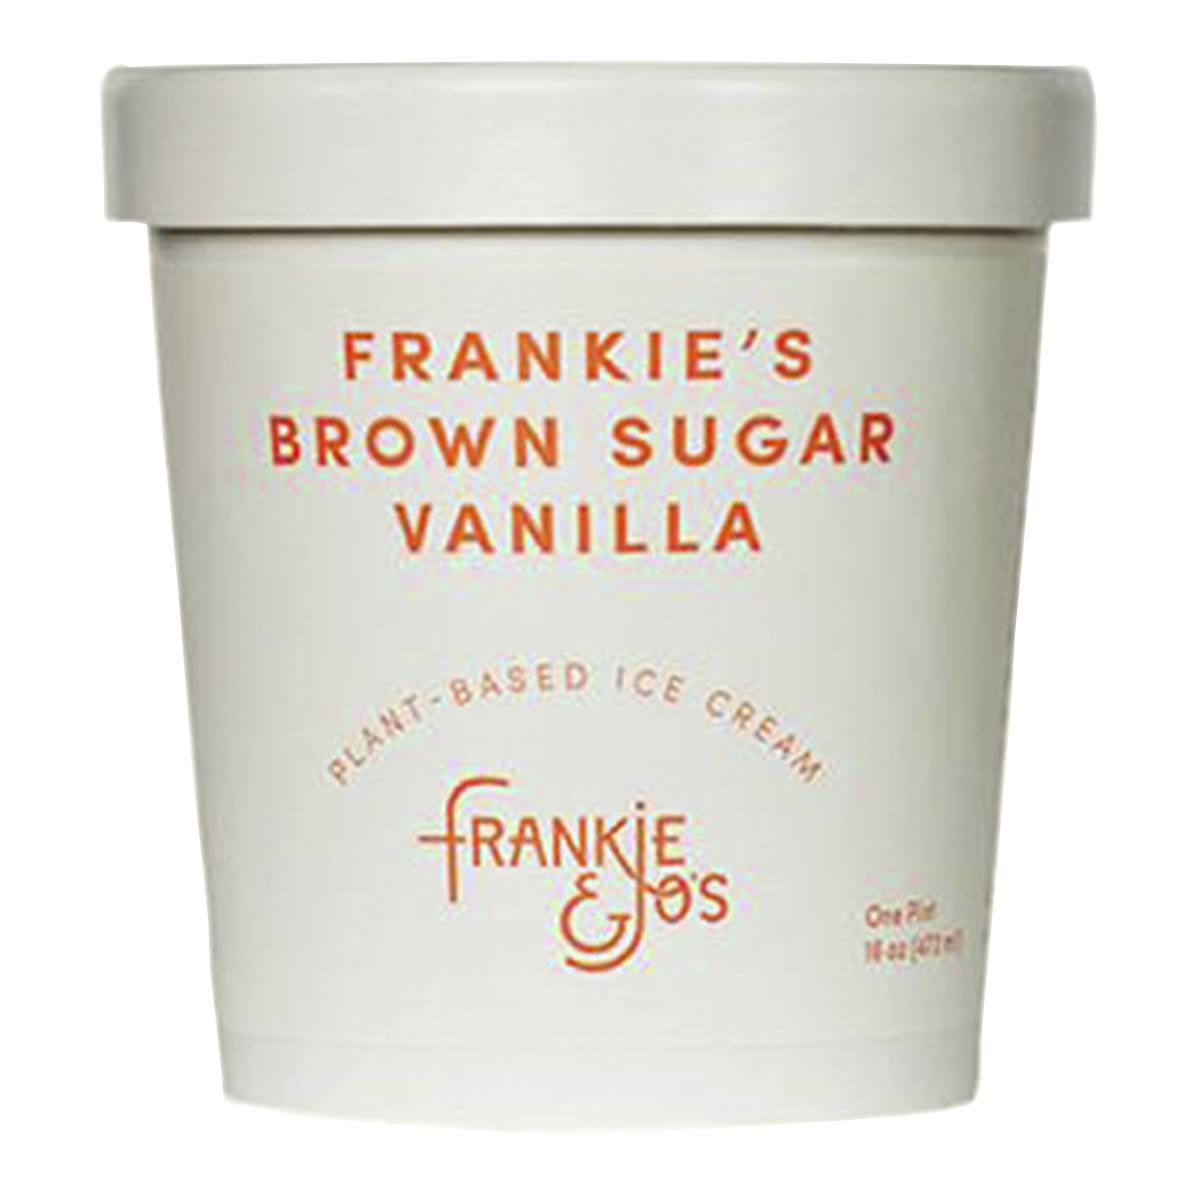 Frankie and Jos Milk Free Ice Cream